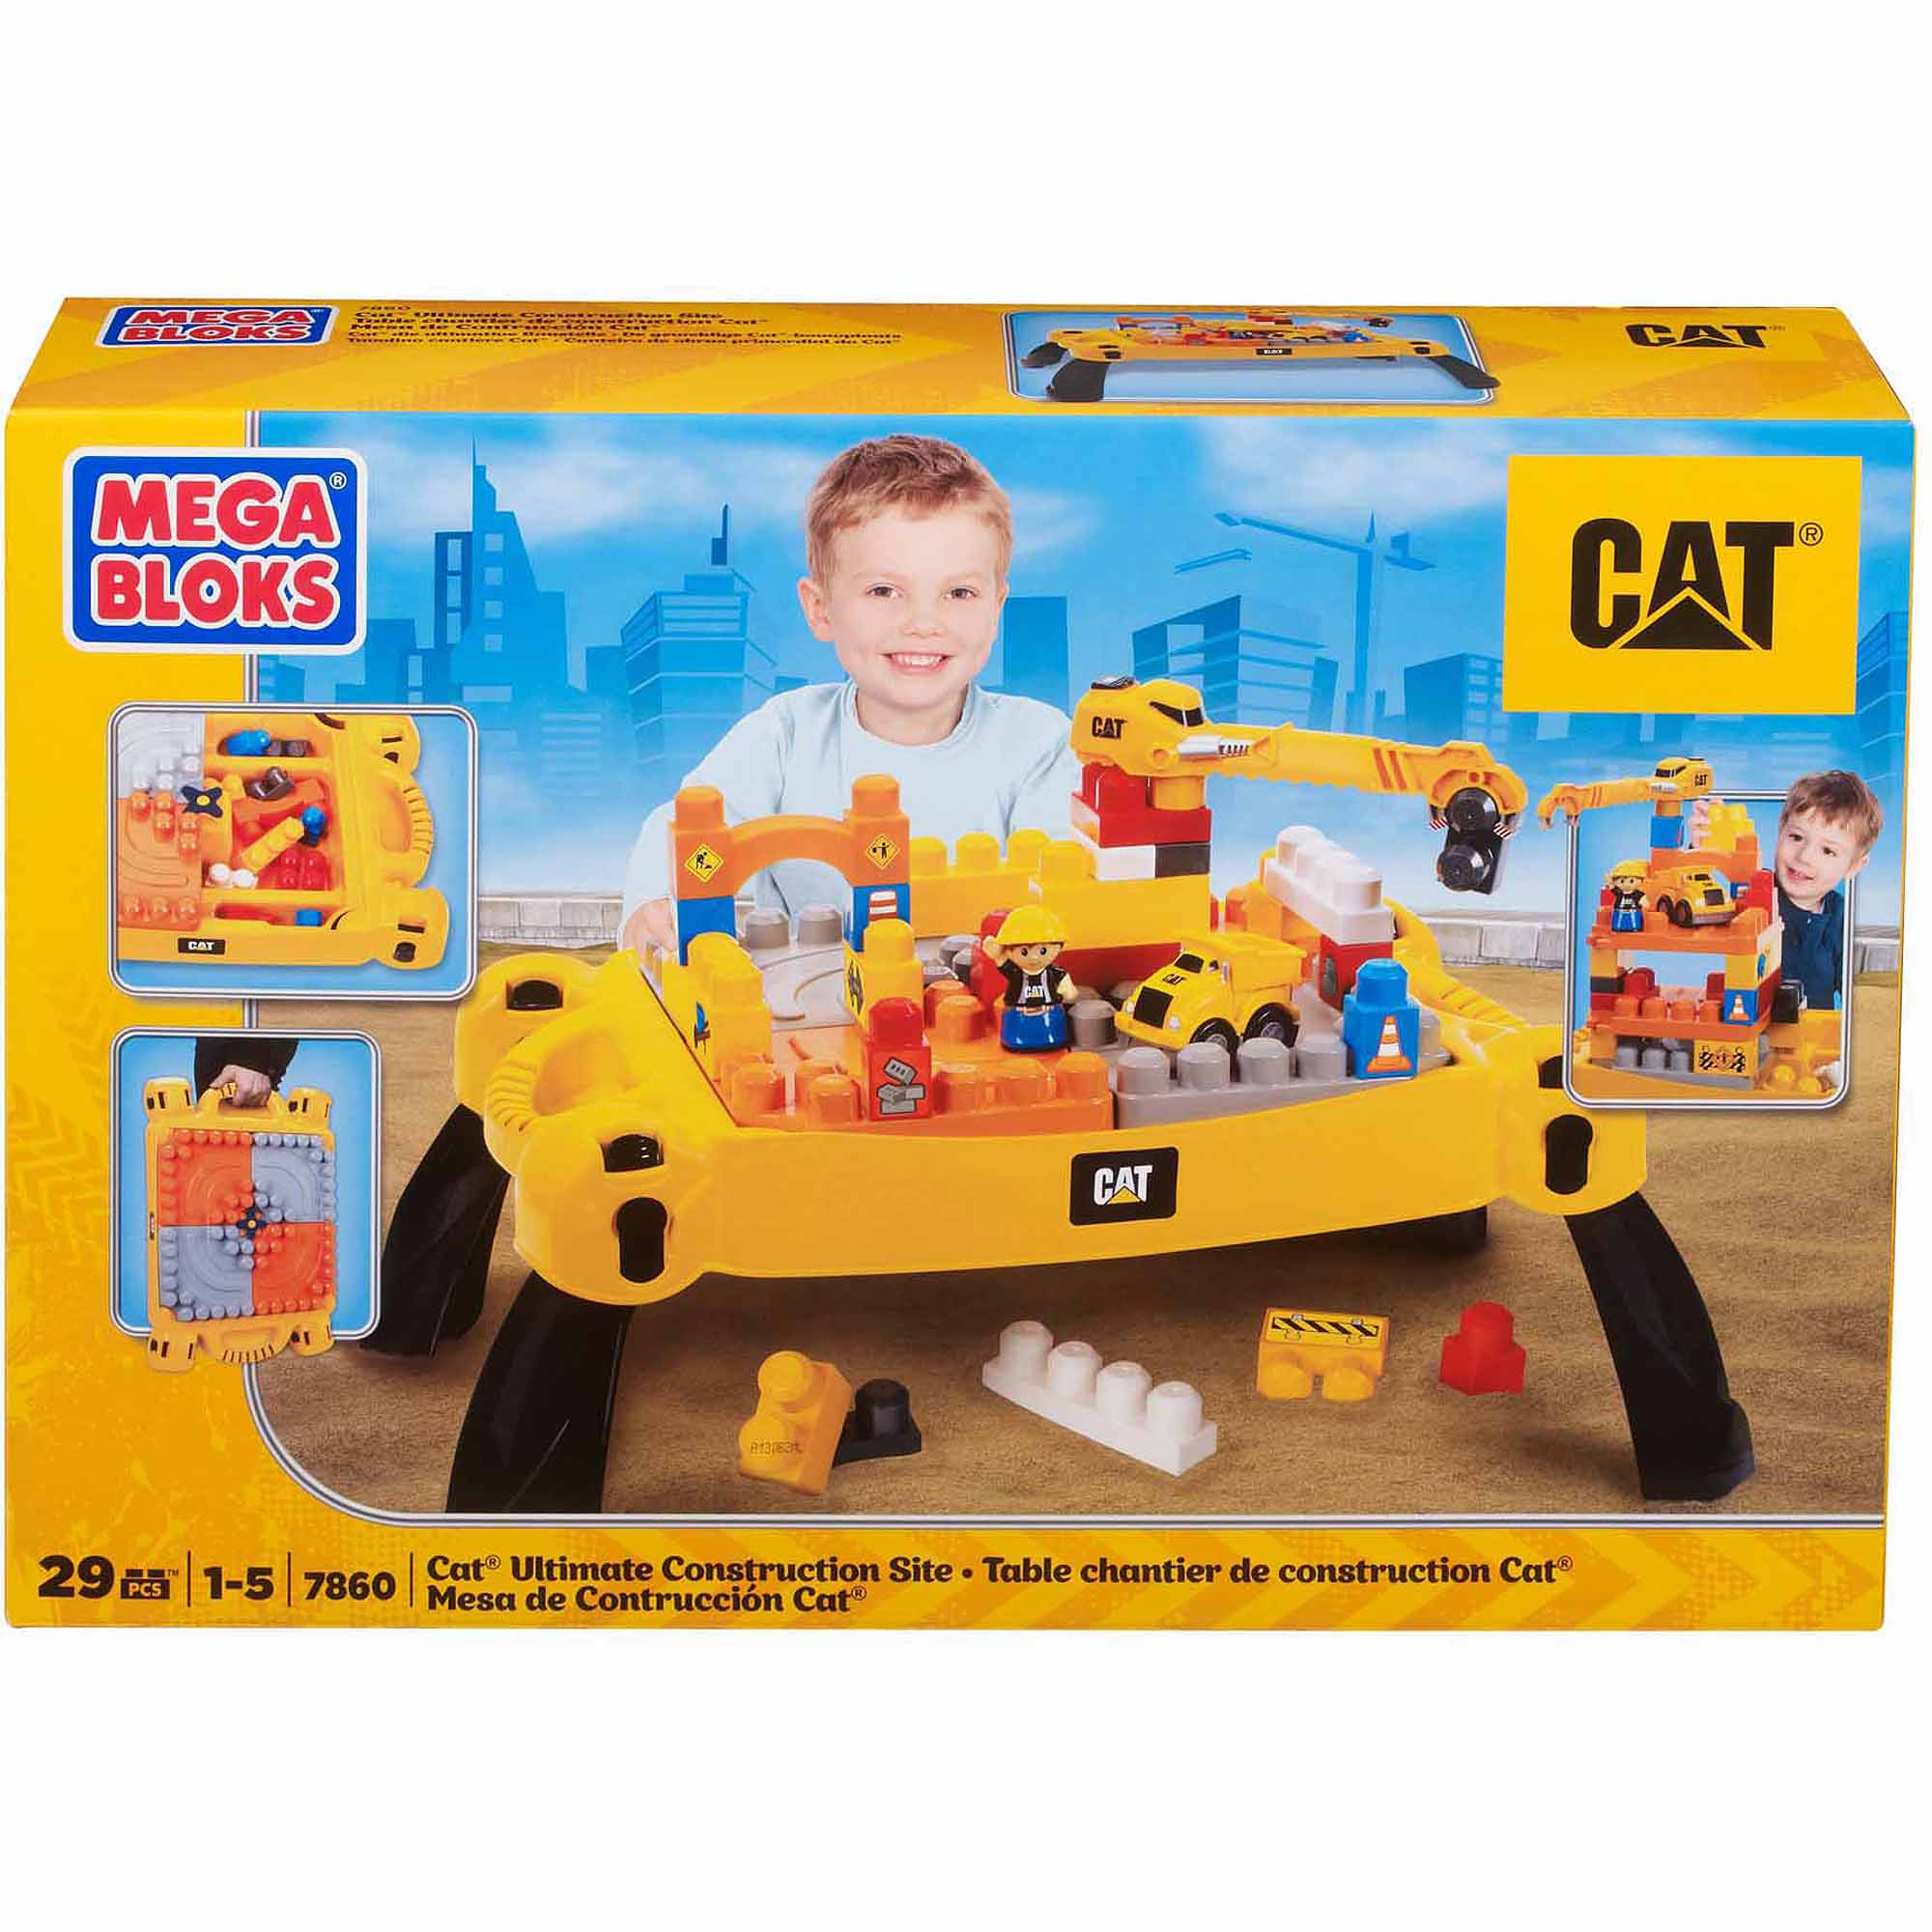 Mega Bloks CAT Ultimate Construction Site - Walmart.com